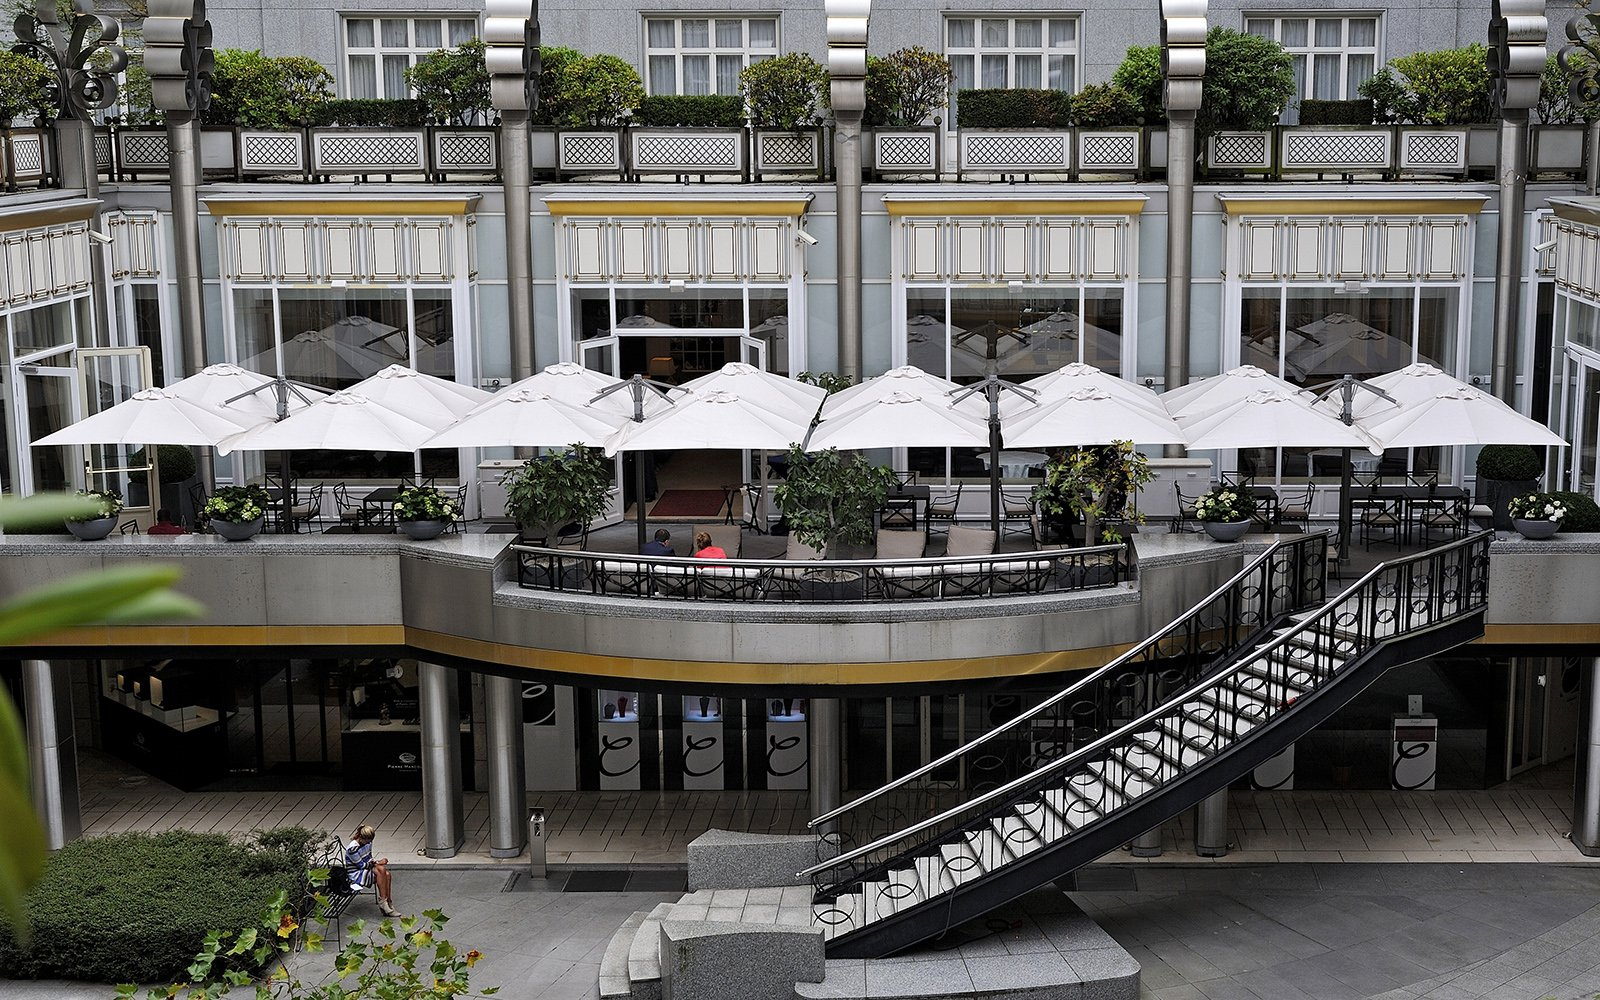 Solero Parasols, Steigenberger Hotels, zweefparasol, parasol, zonbescherming, the art of living